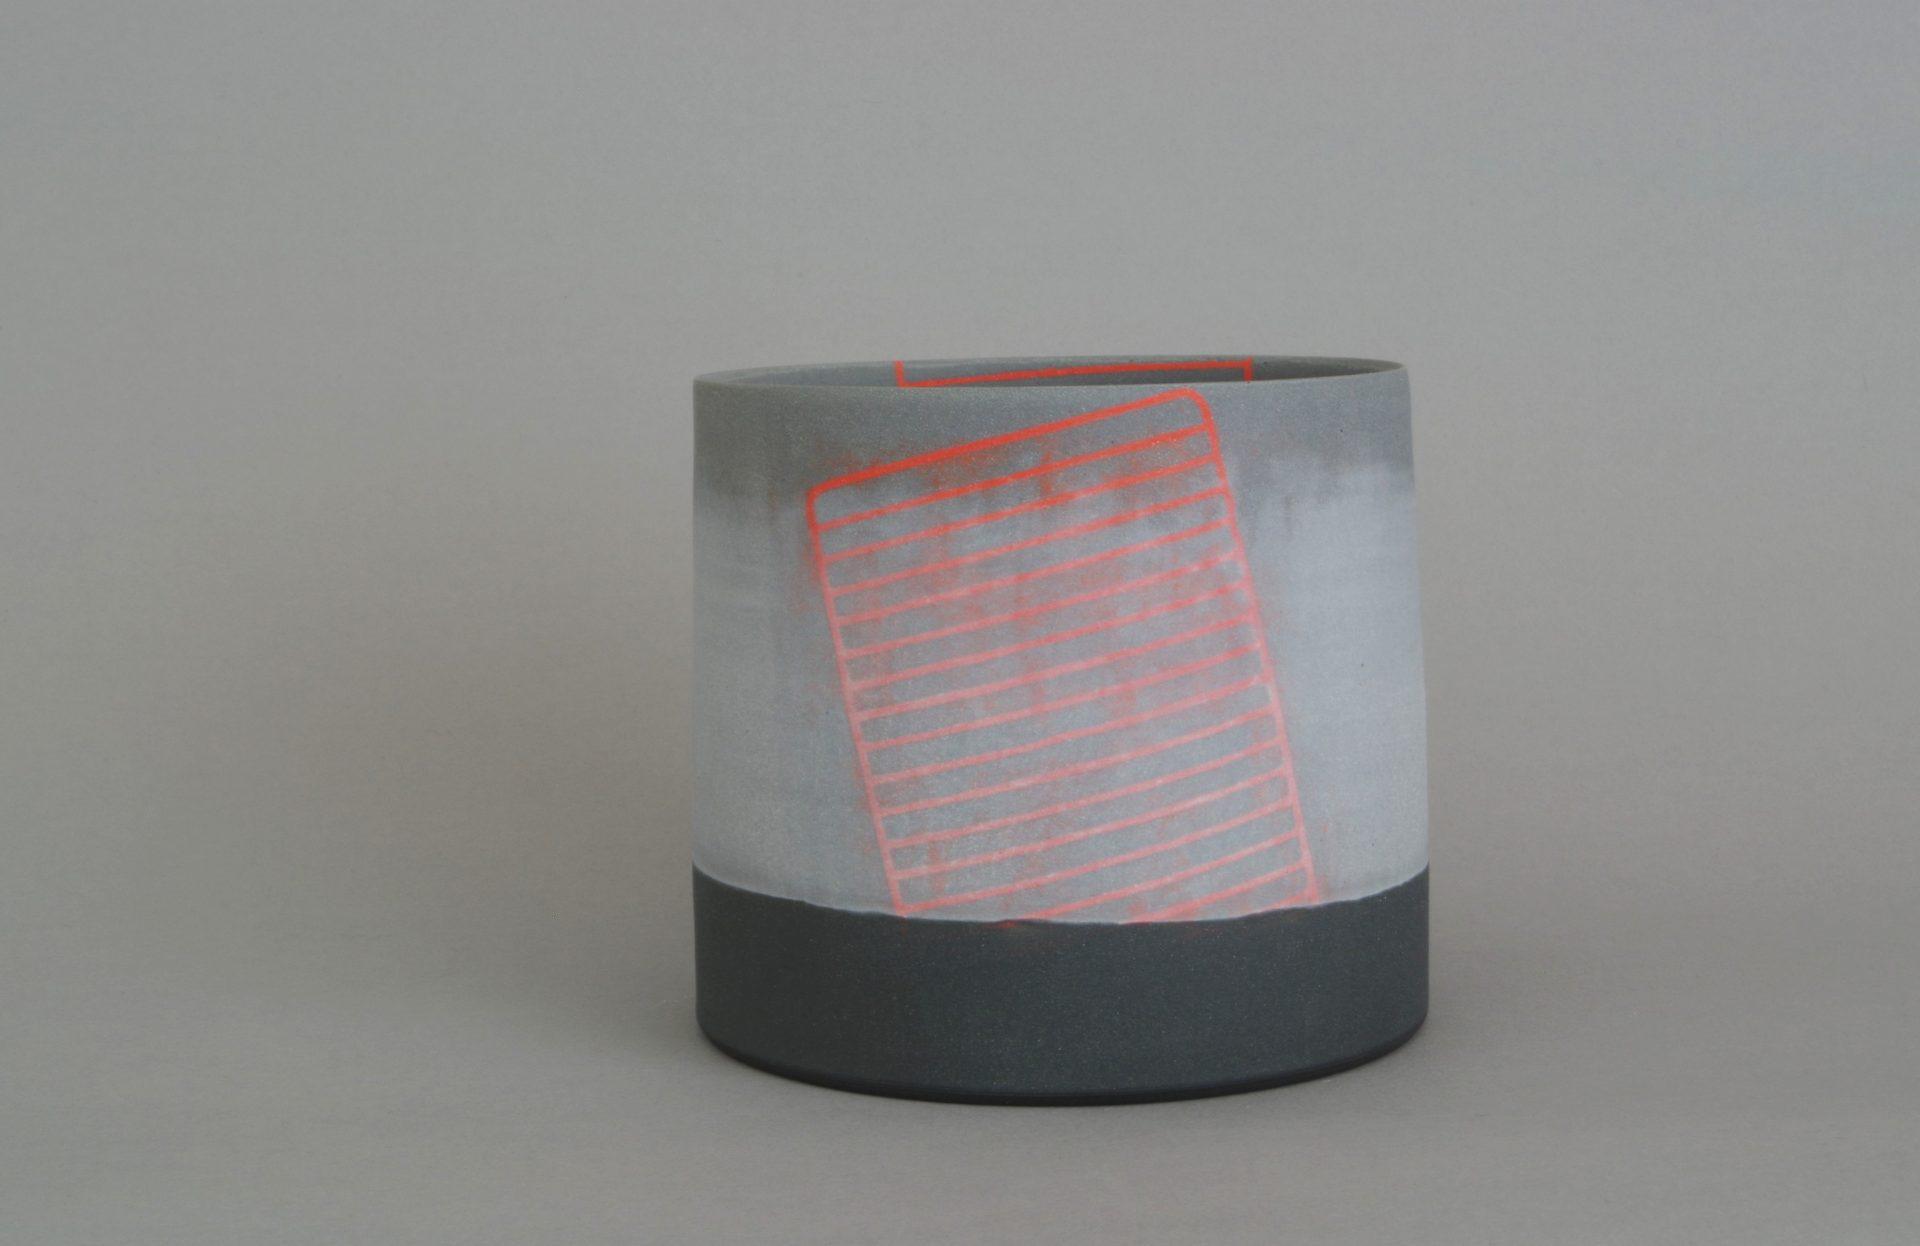 97-rising-grille-h10cm-sept-14-£295